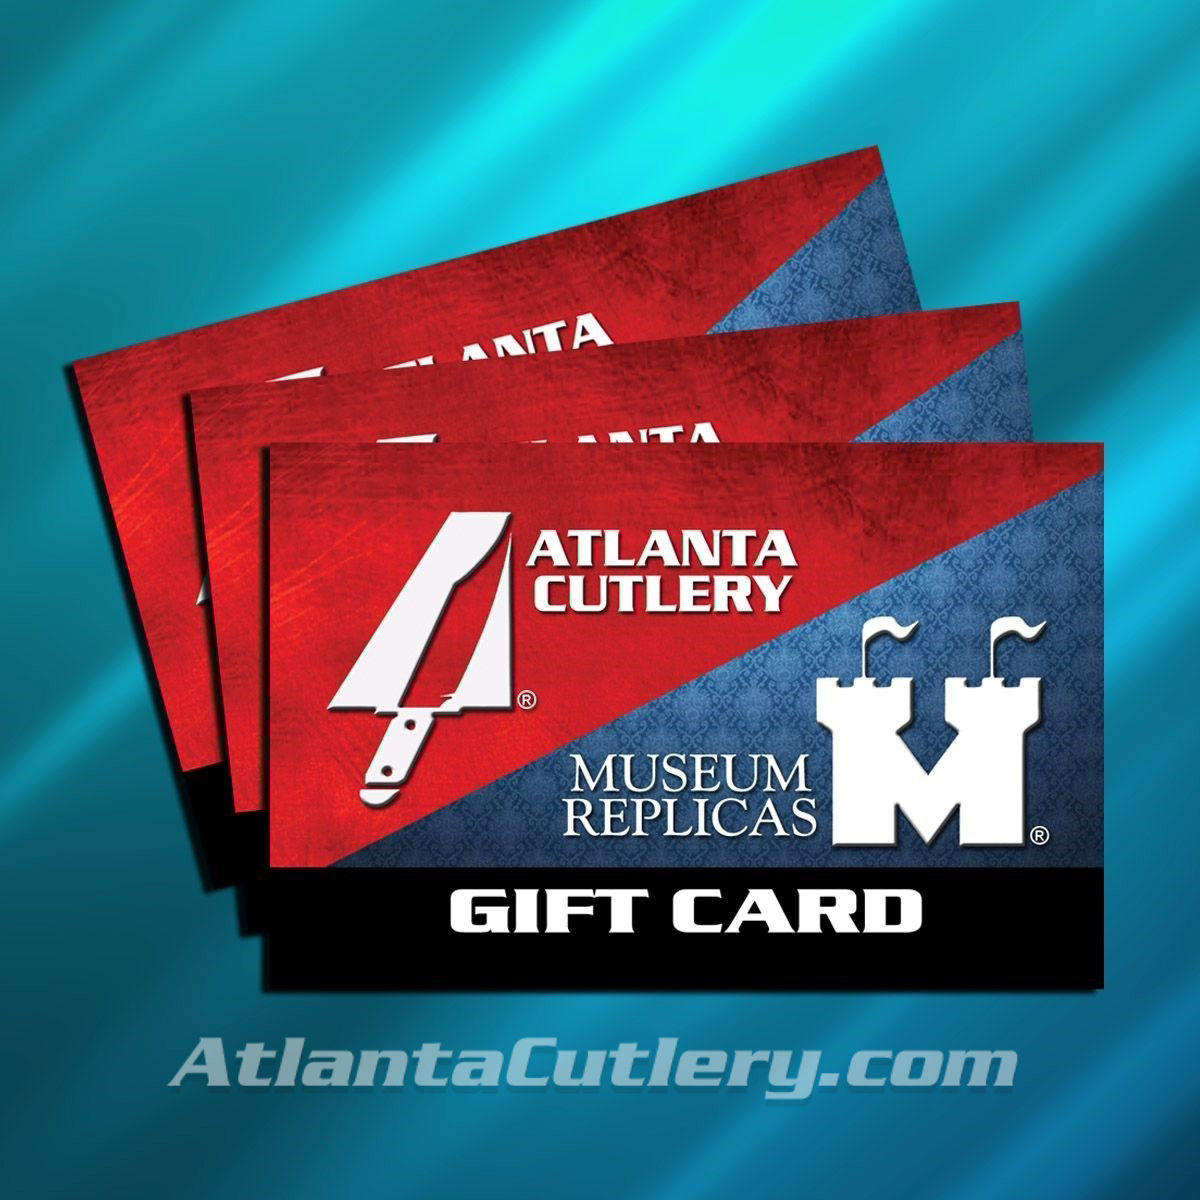 Gift Card of Atlanta Cutlery